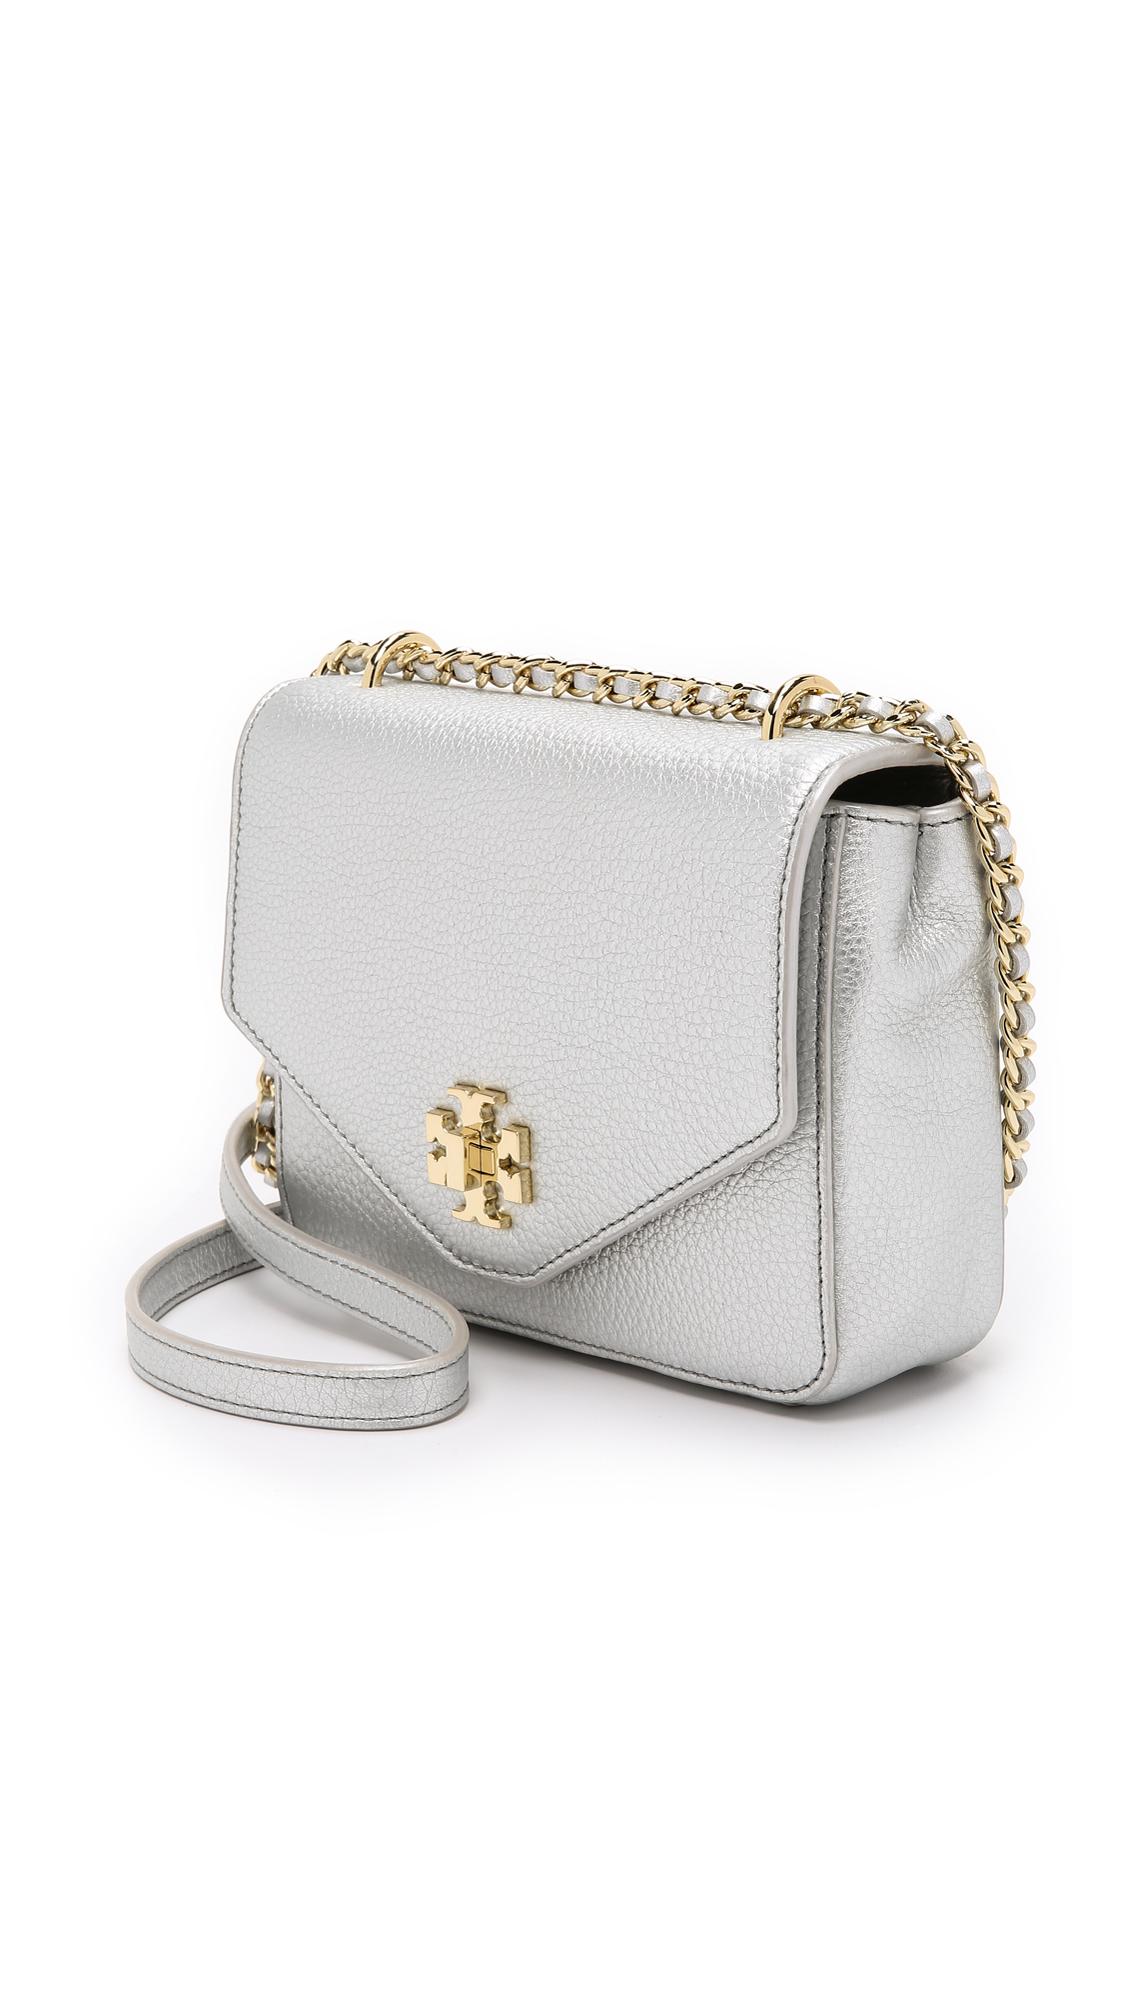 da4e8a47e3a Tory Burch Kira Metallic Mini Chain Cross Body Bag